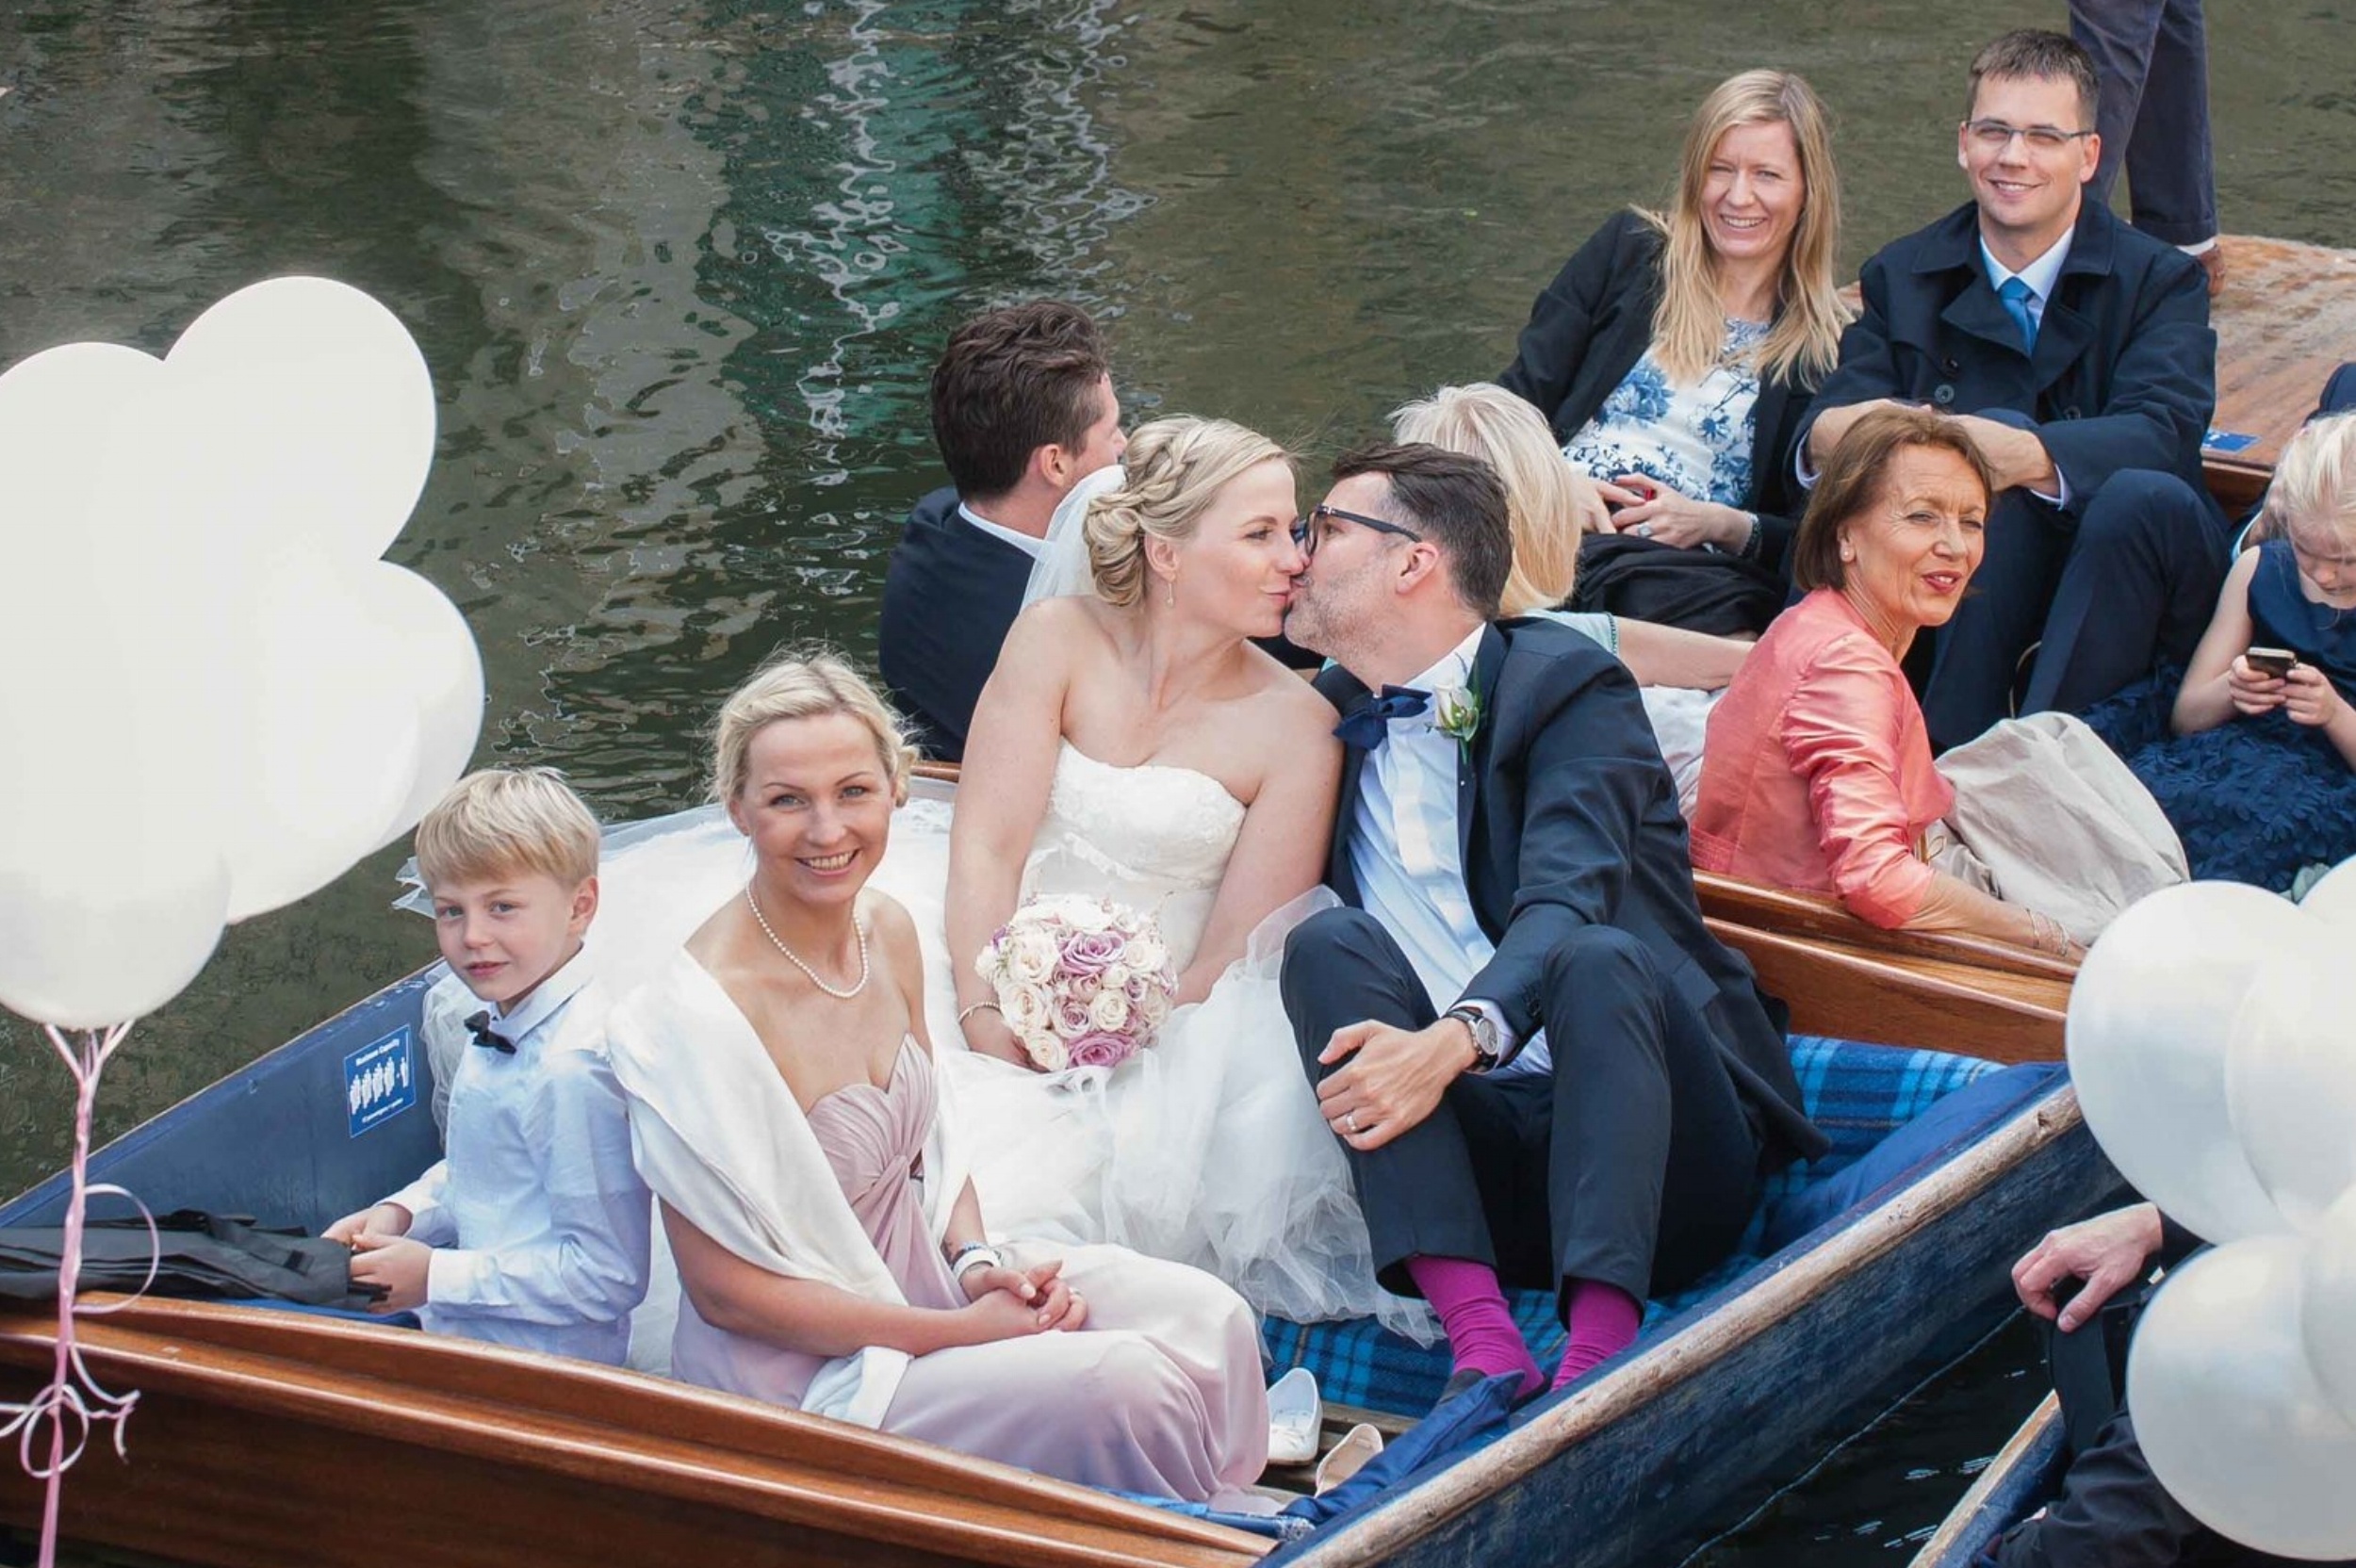 Adrian_Nicole_Charnwood_Weddings_Queens_College_Cambridge-1048.jpg